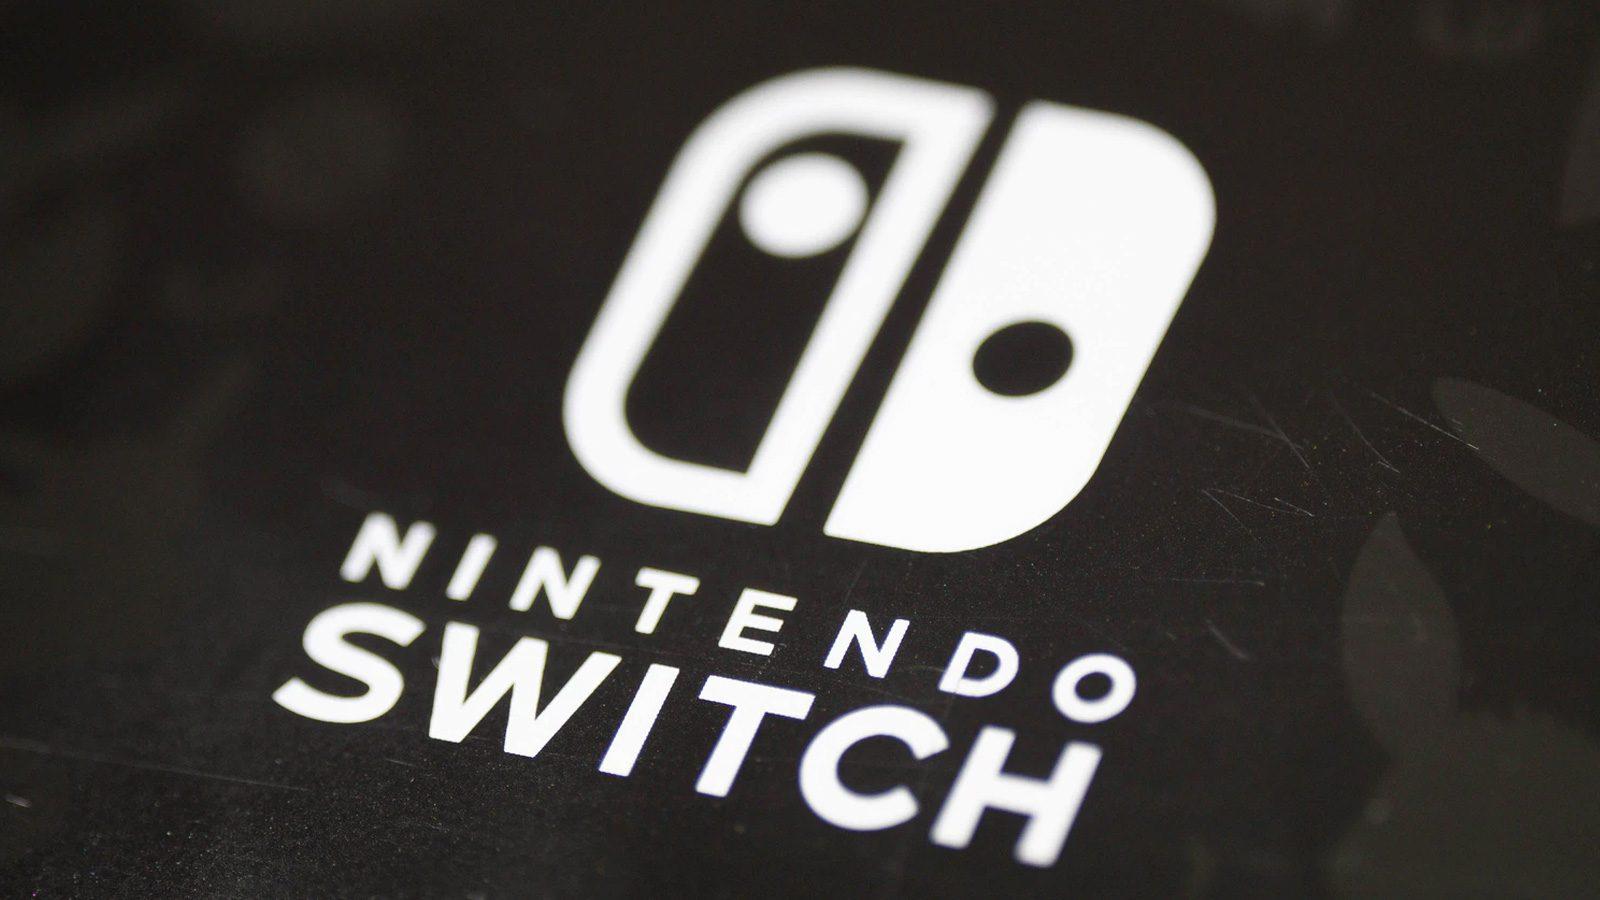 Nintendo New Switch